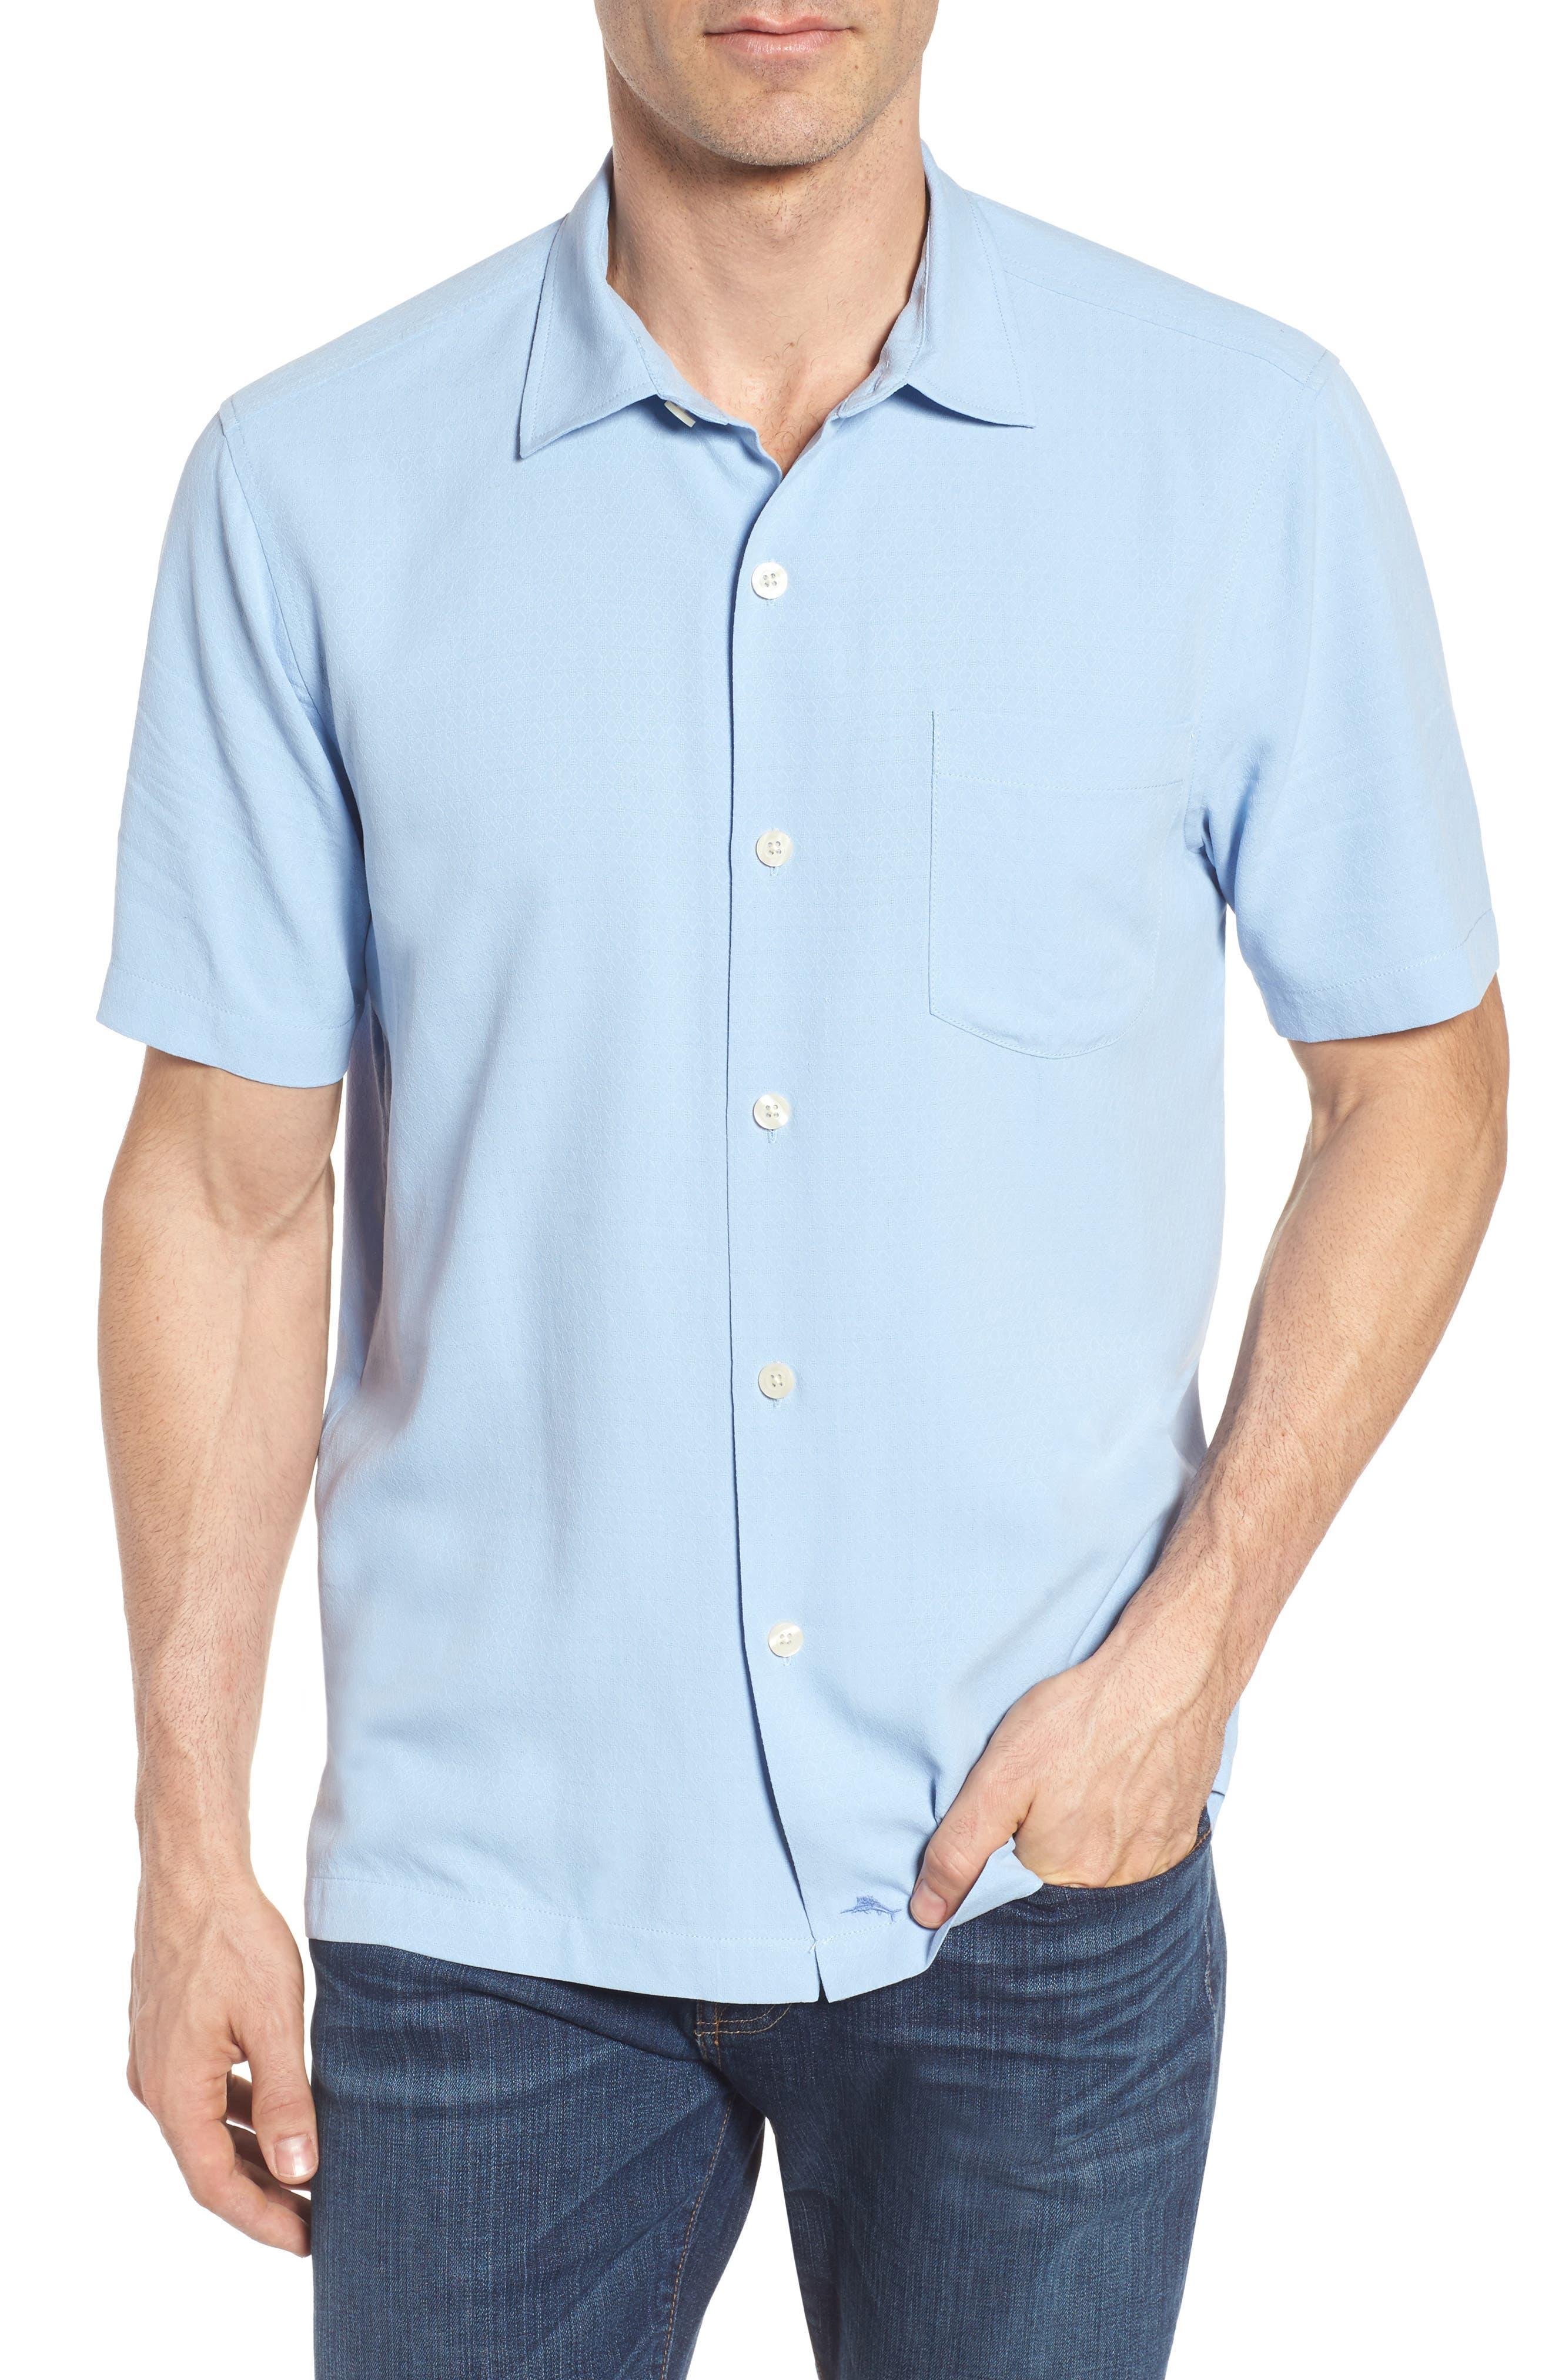 Oasis Jacquard Silk Sport Shirt,                             Main thumbnail 1, color,                             400